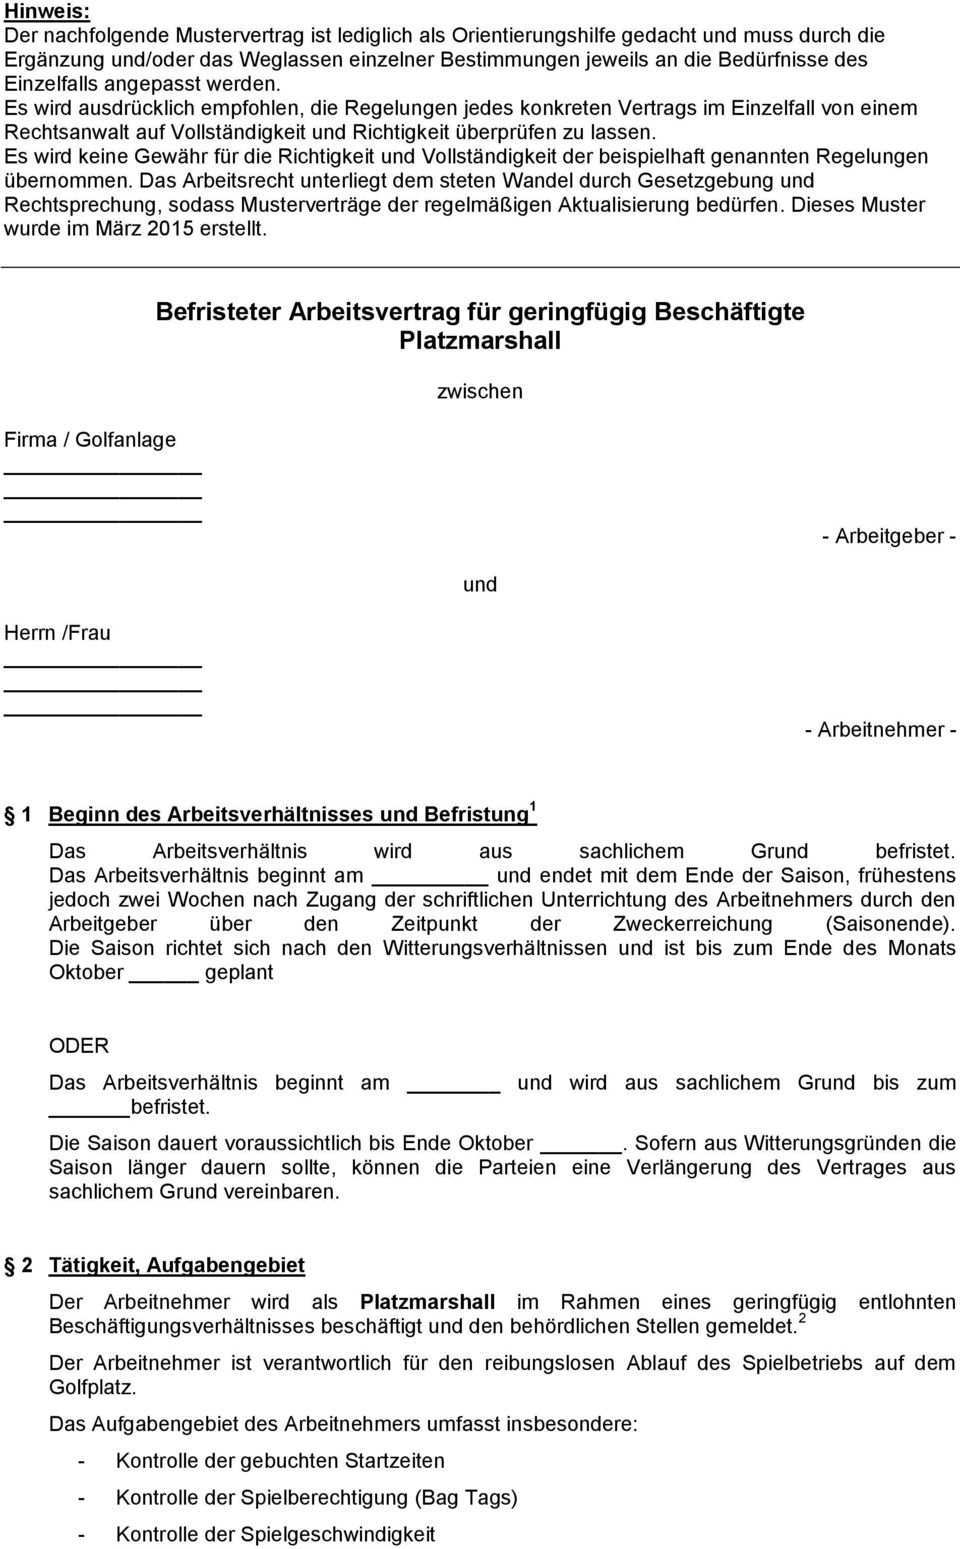 Befristeter Arbeitsvertrag Fur Geringfugig Beschaftigte Platzmarshall Pdf Free Download